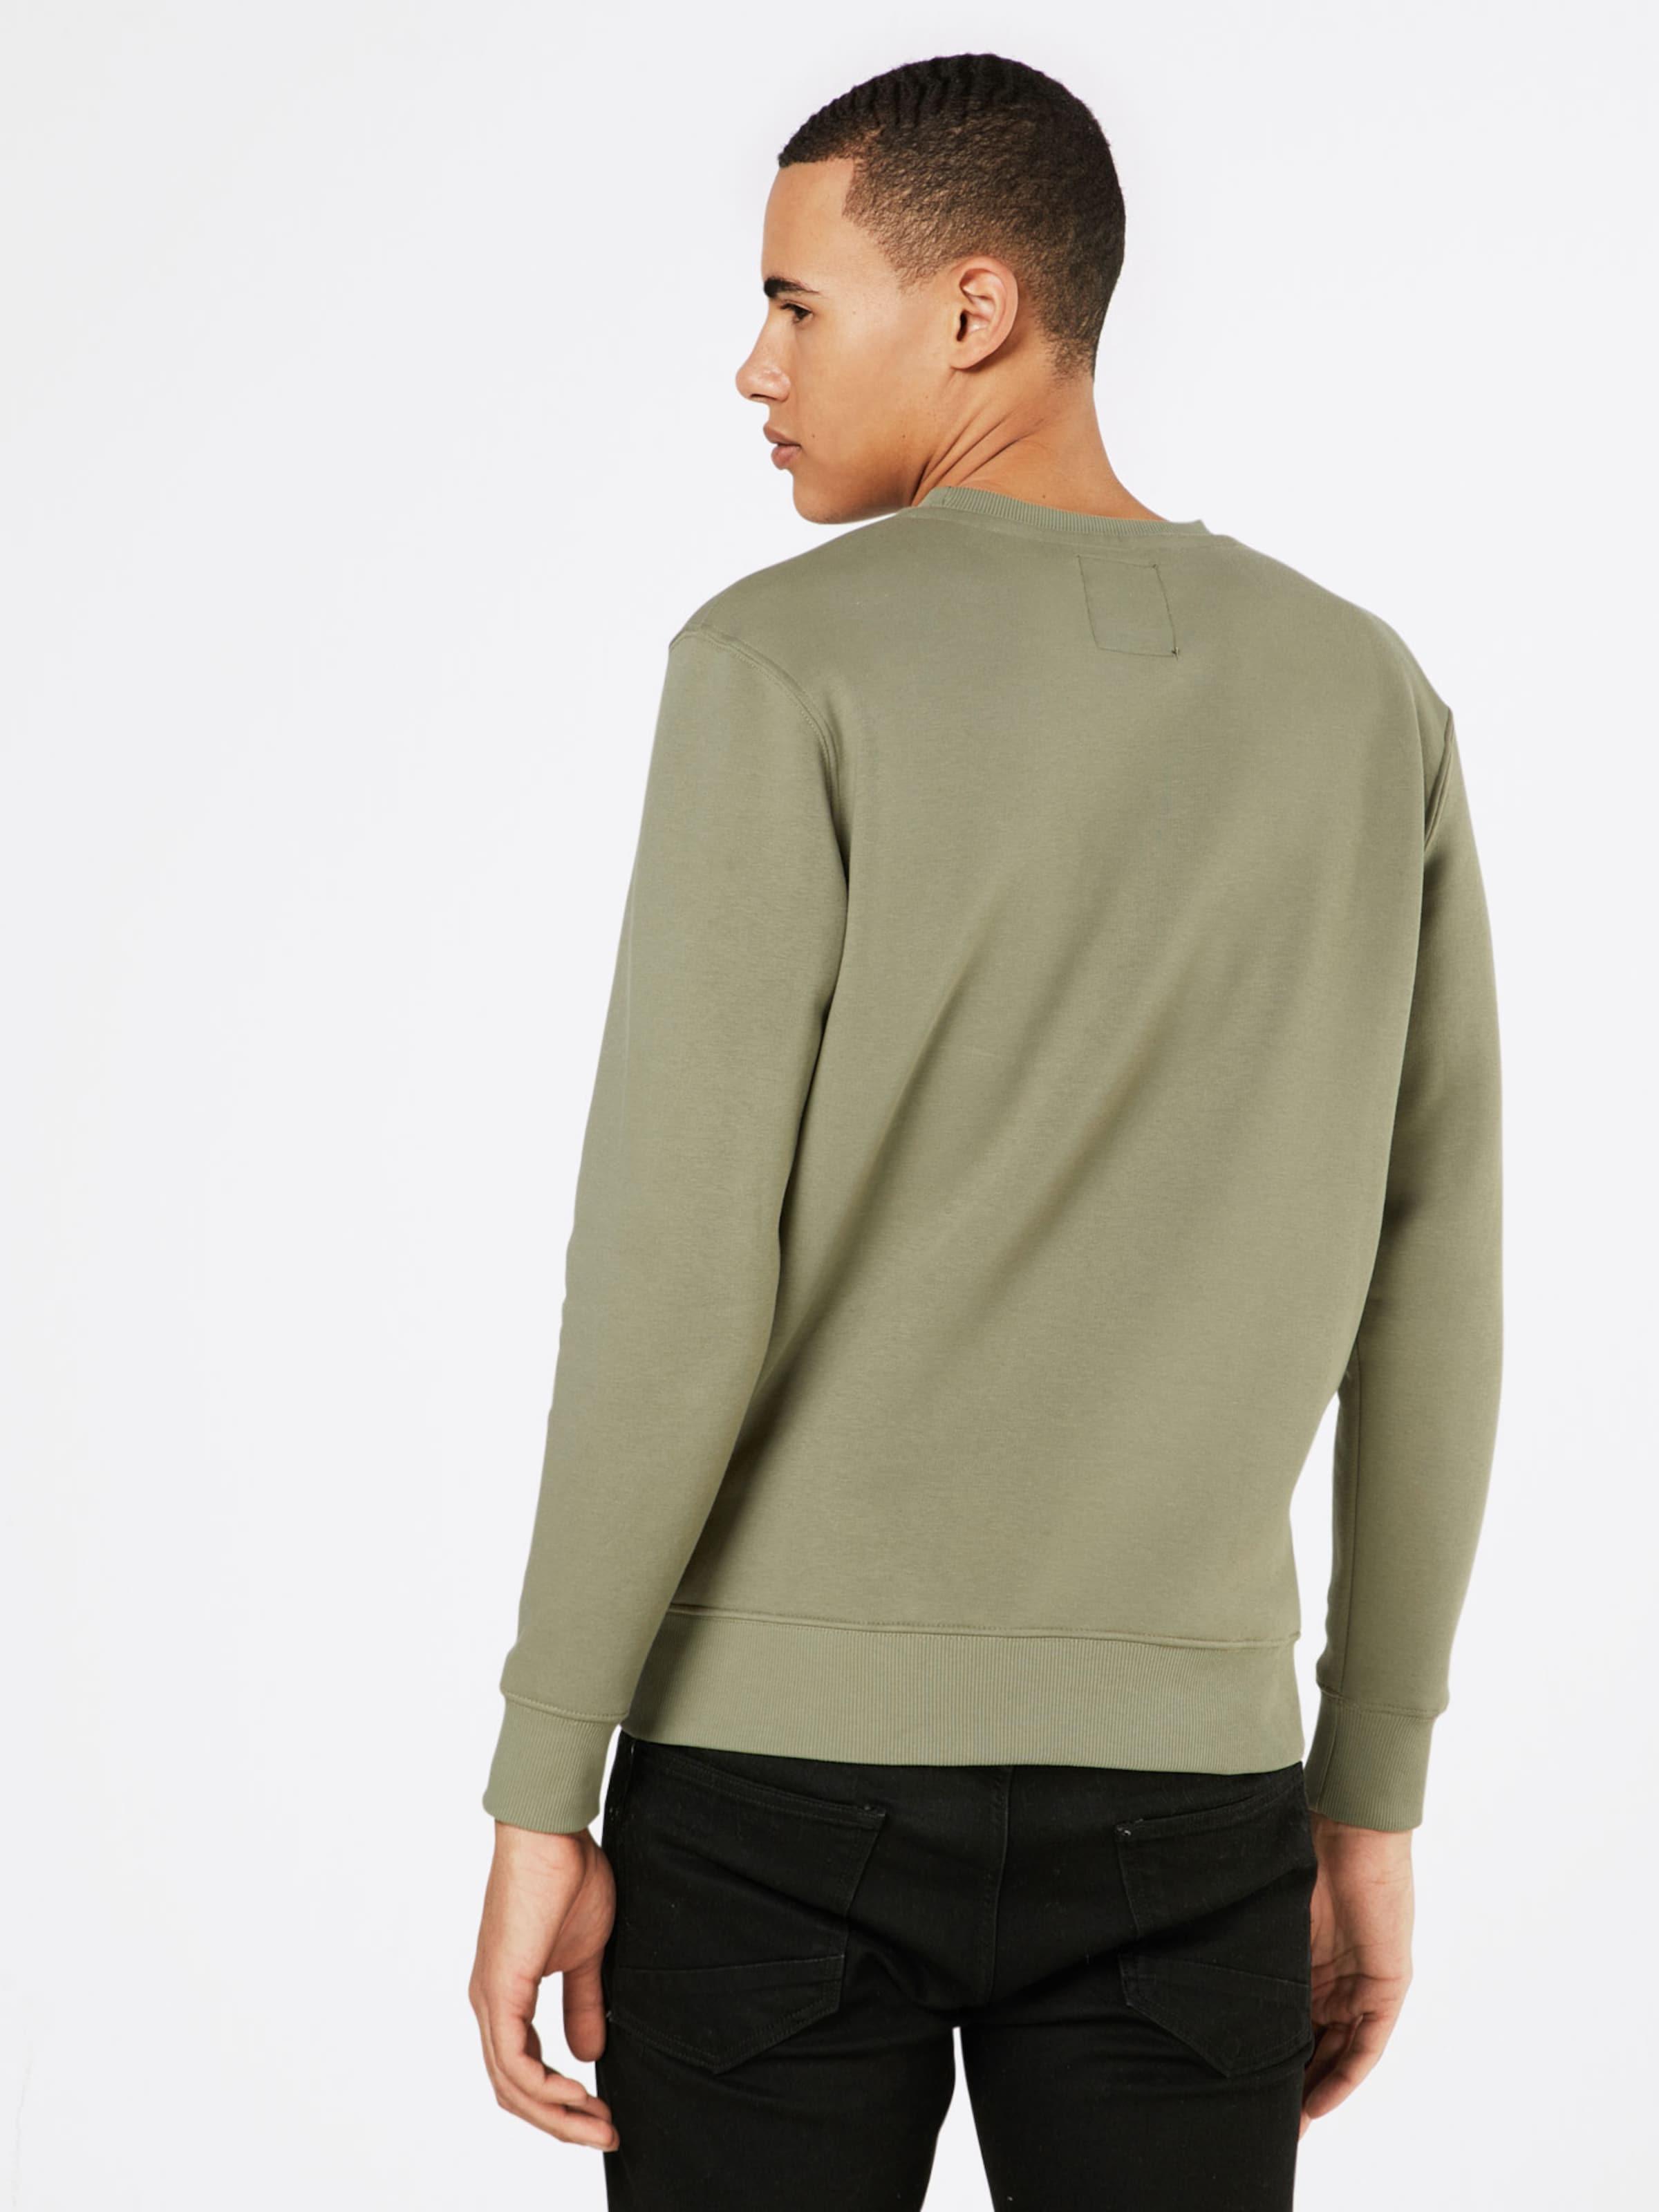 Alpha En Blanc shirt 'basic' Industries Sweat iukOPXZ